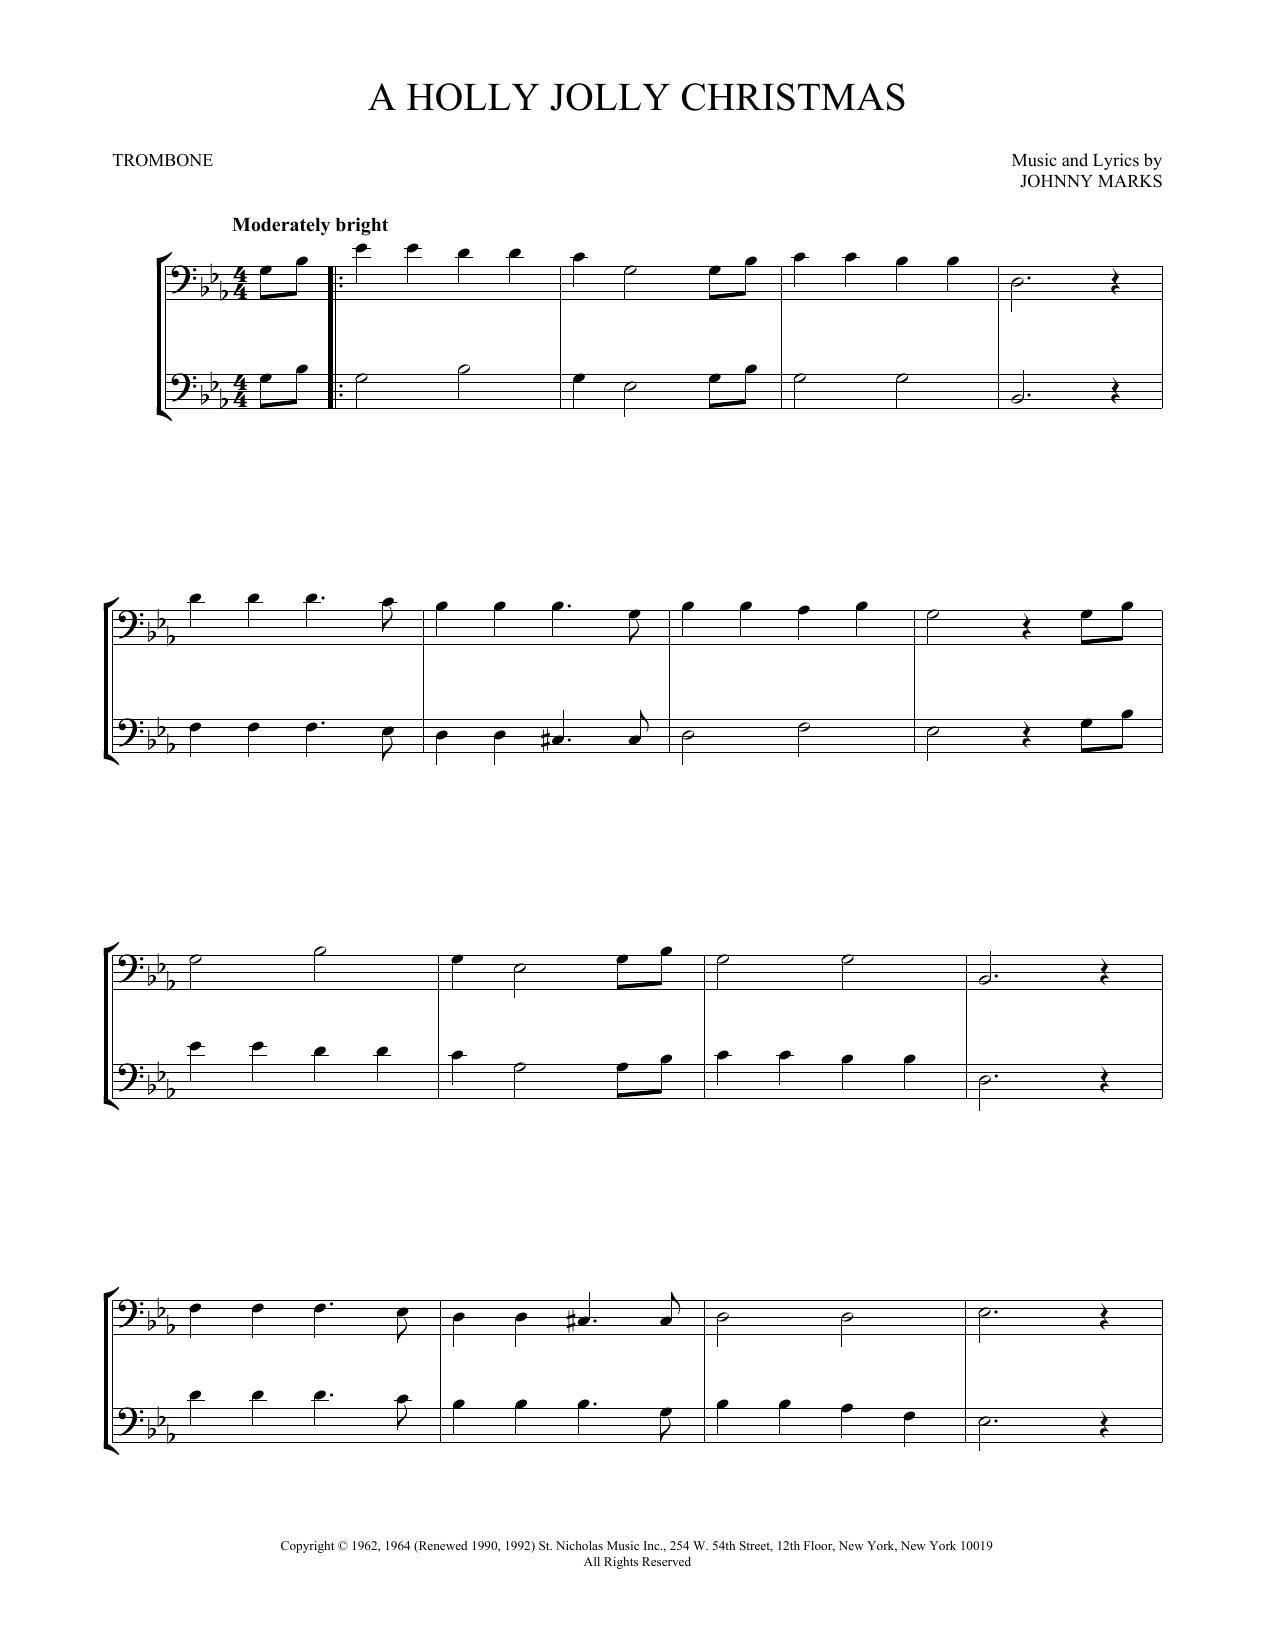 A Holly Jolly Christmas (Trombone Duet)